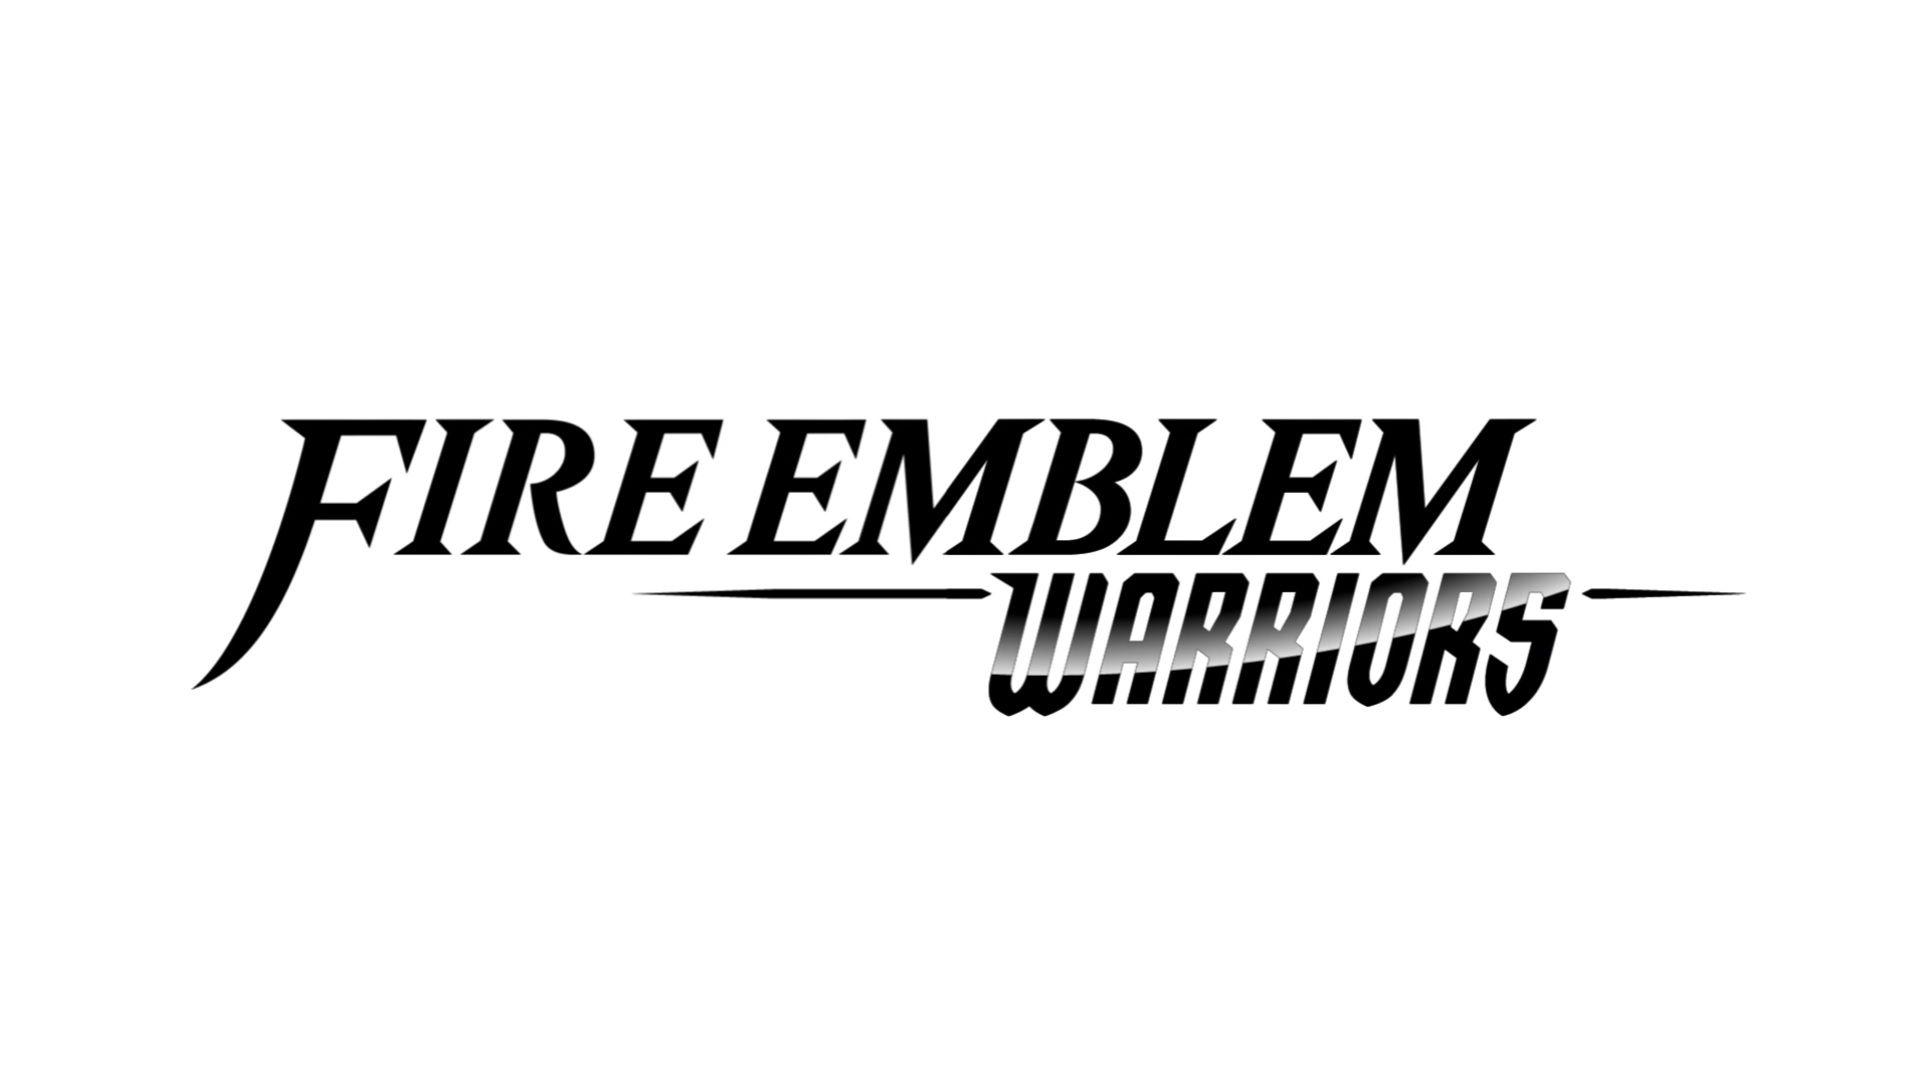 Fire Emblem Evento Direct In Onda Questa Sera Alle 23 00